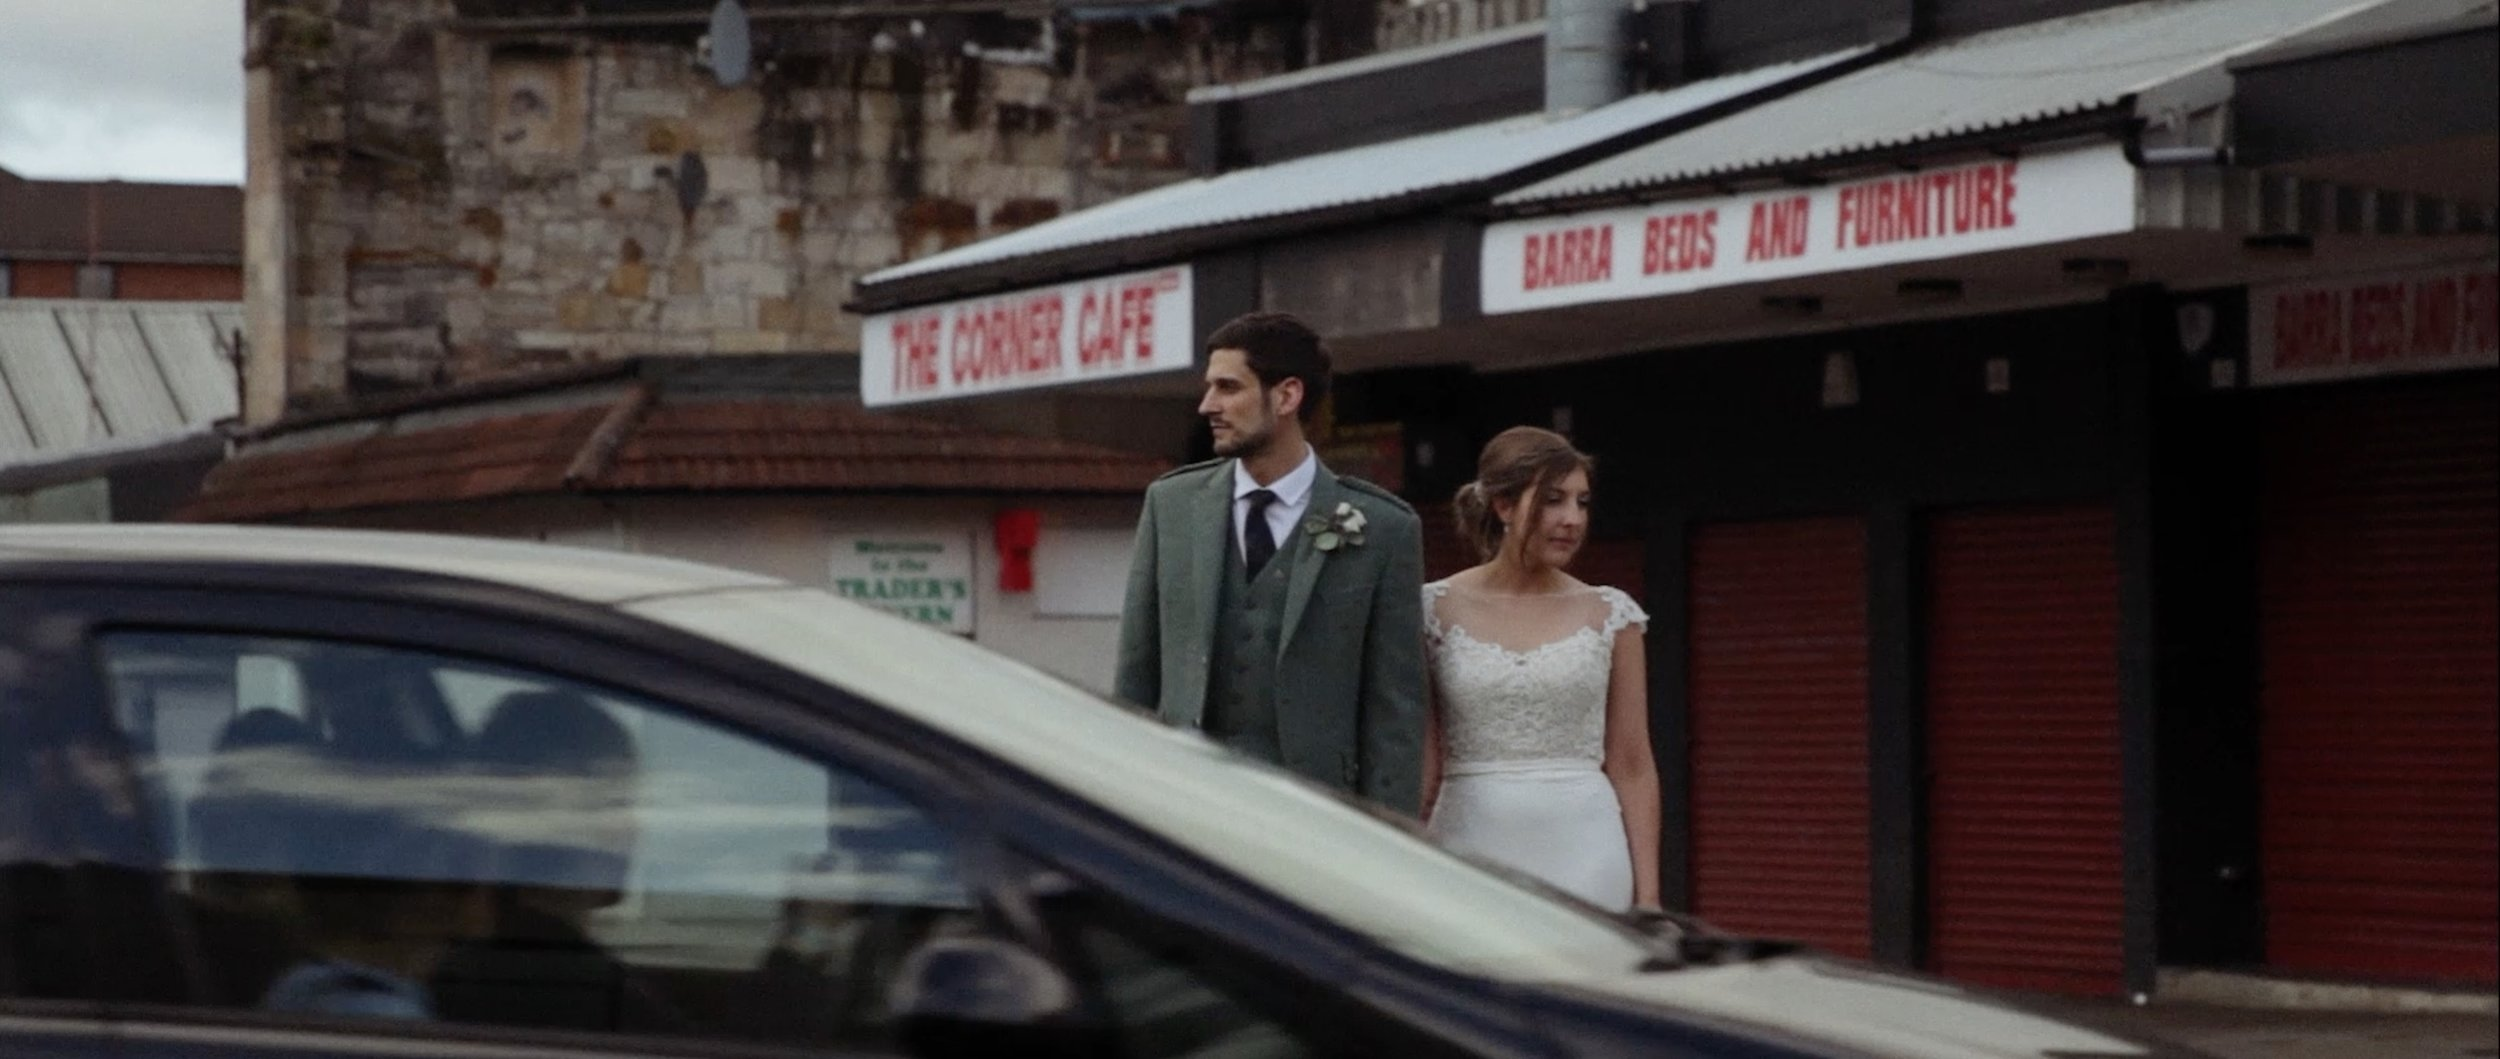 gleddoch-hotel-wedding-videographer_LL_05.jpg